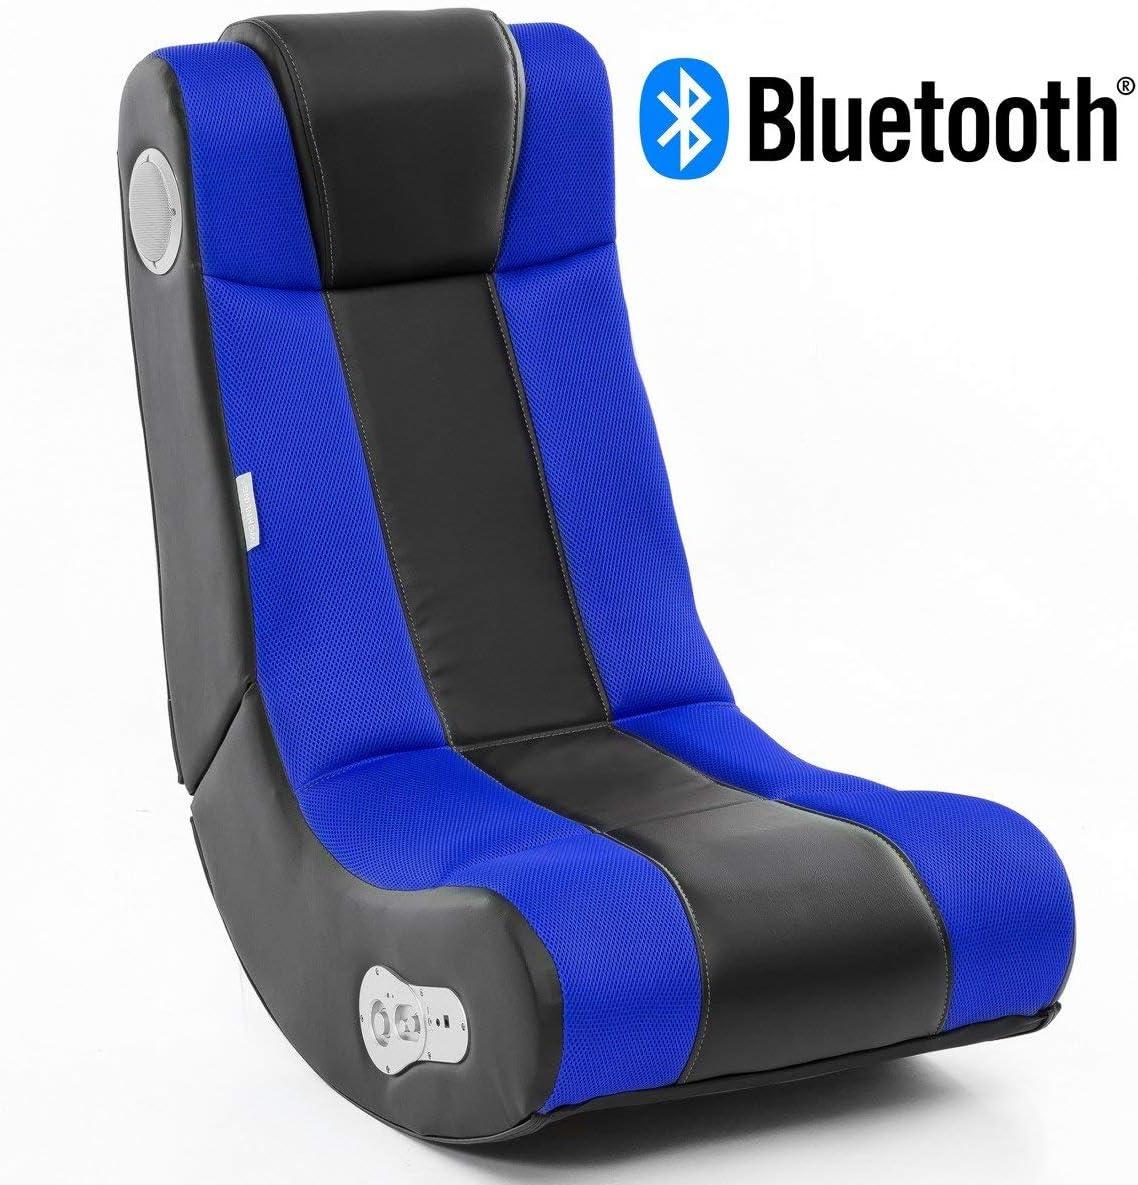 24Designs Soundchair Max en Noir Bleu avec Bluetooth, Haut